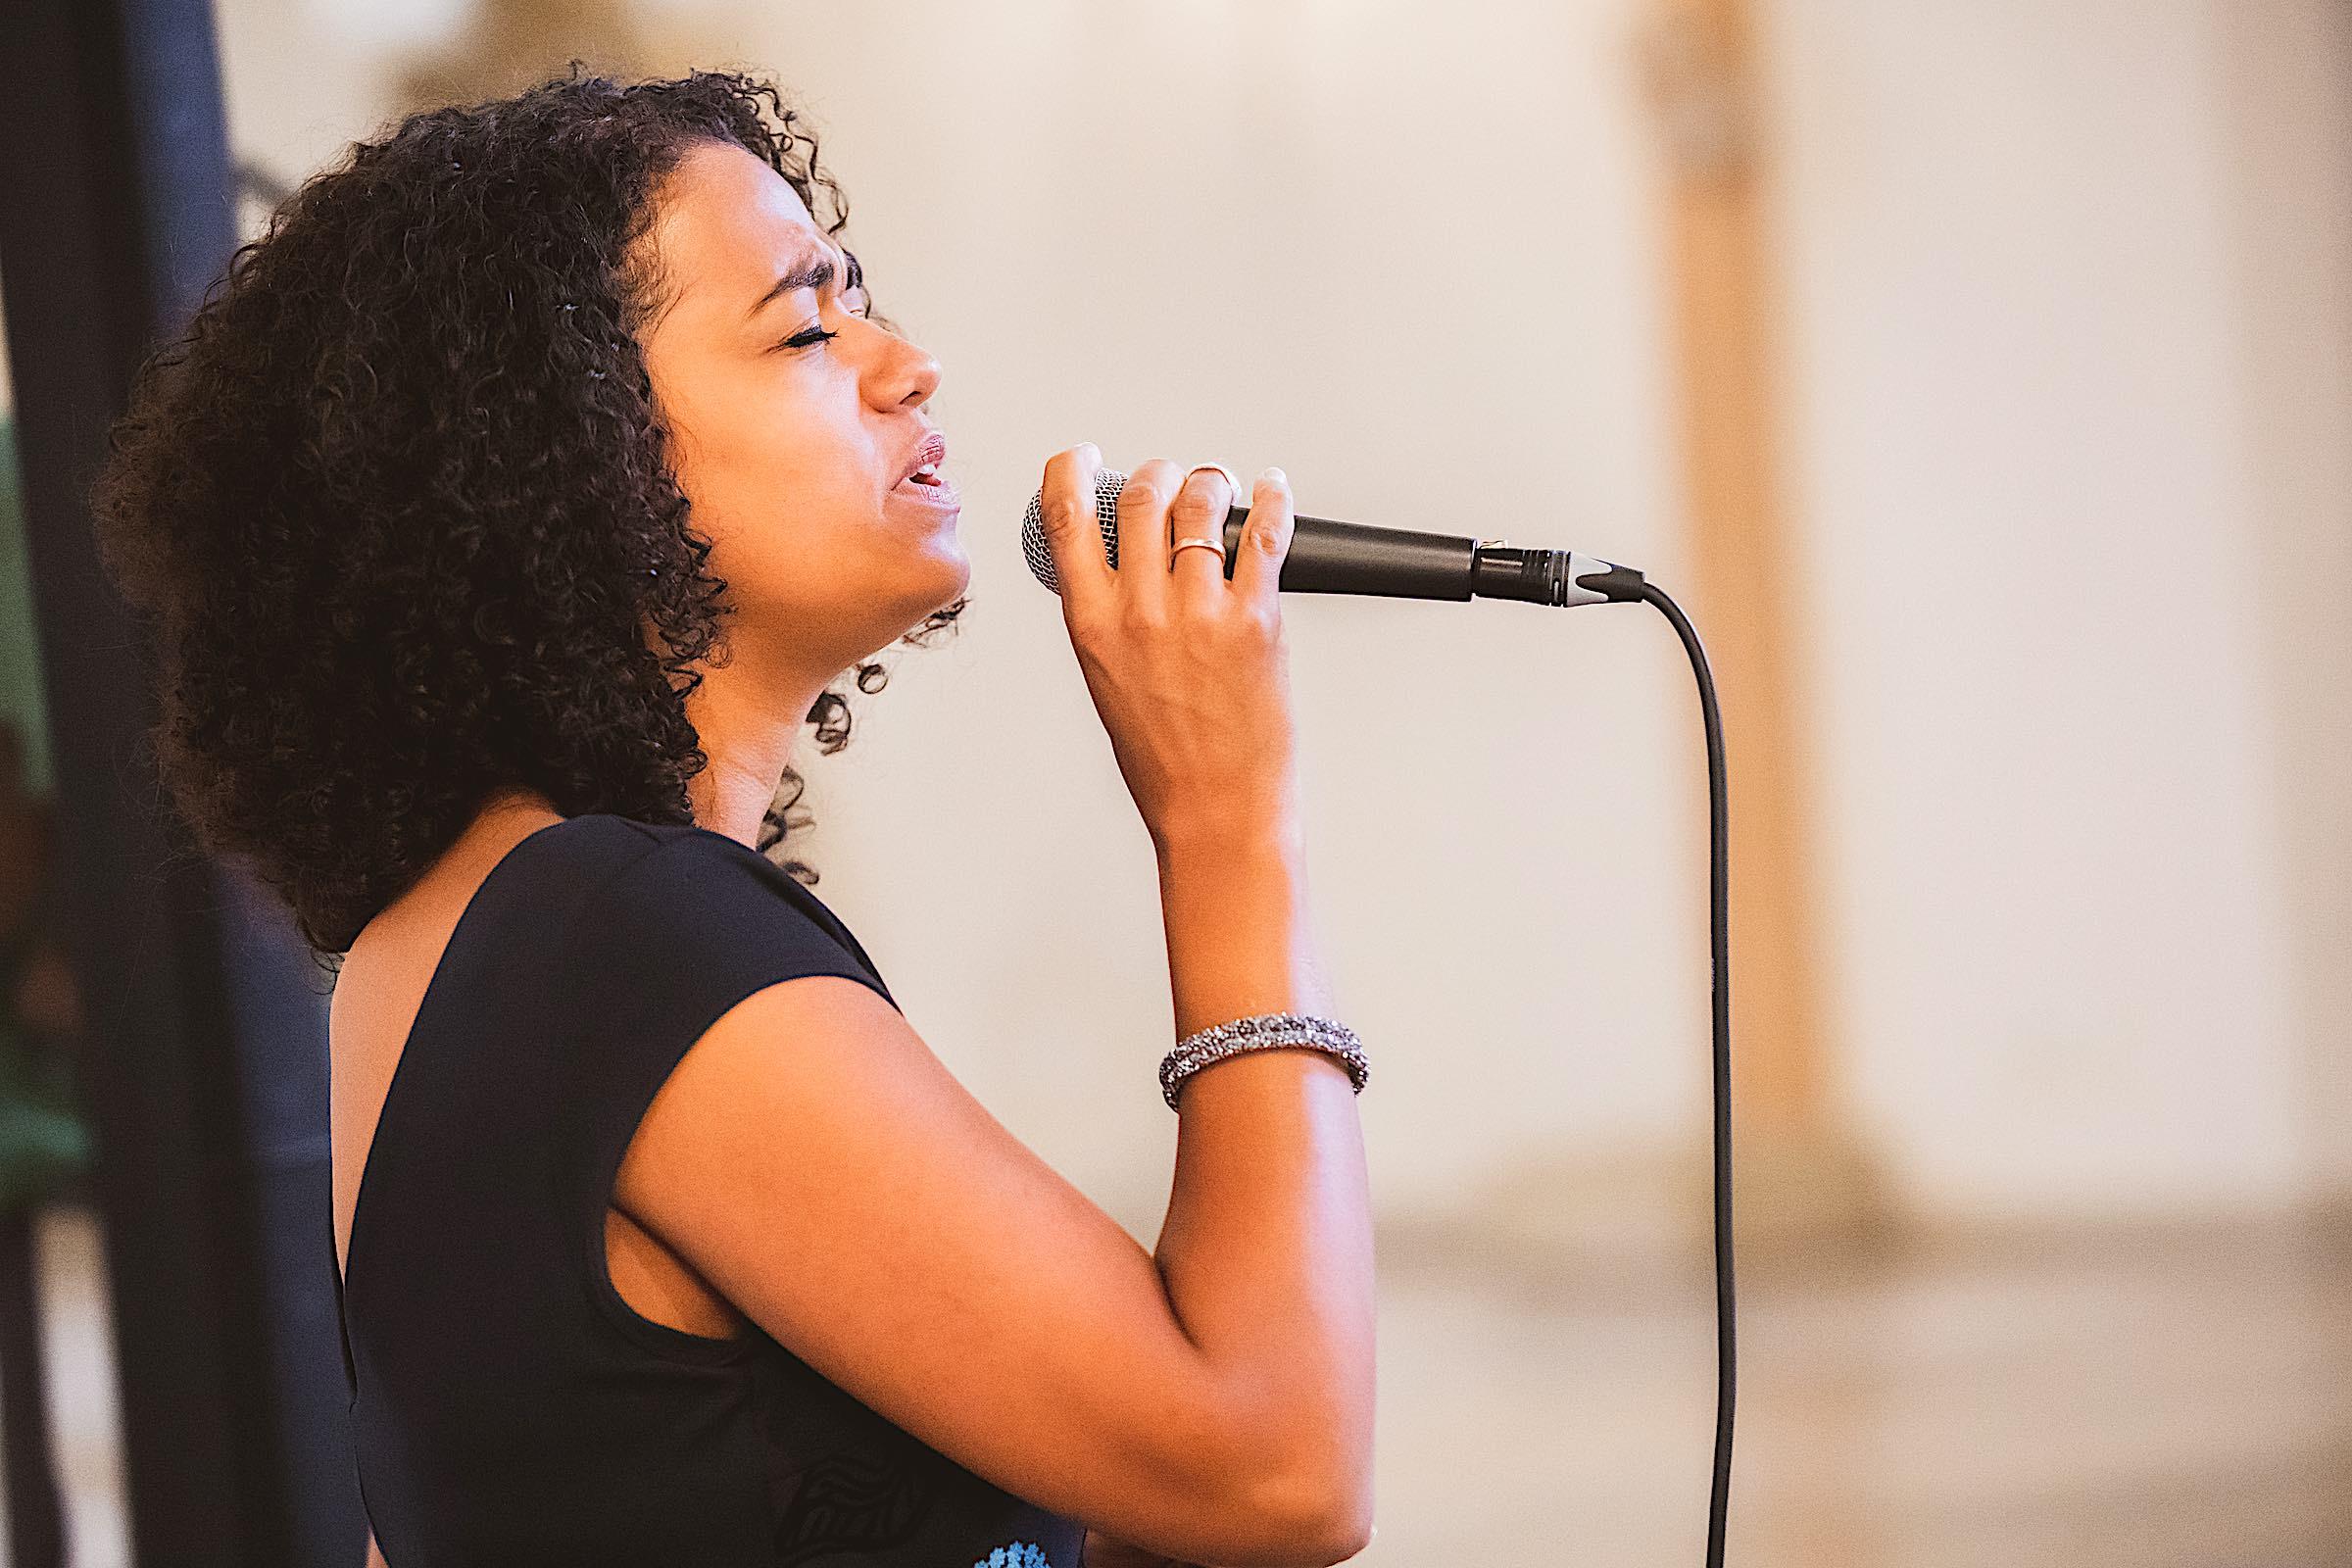 hochzeitssängerin | Hannover | Mieten | Sängerin | Kirchensängerin | Hochzeit | Lieder | Sängerin | Trauung | Sängerin | Trauung | Sängerin | Preise | Kirche | Nathalie | Chérestal | Lehmann | Eventservice